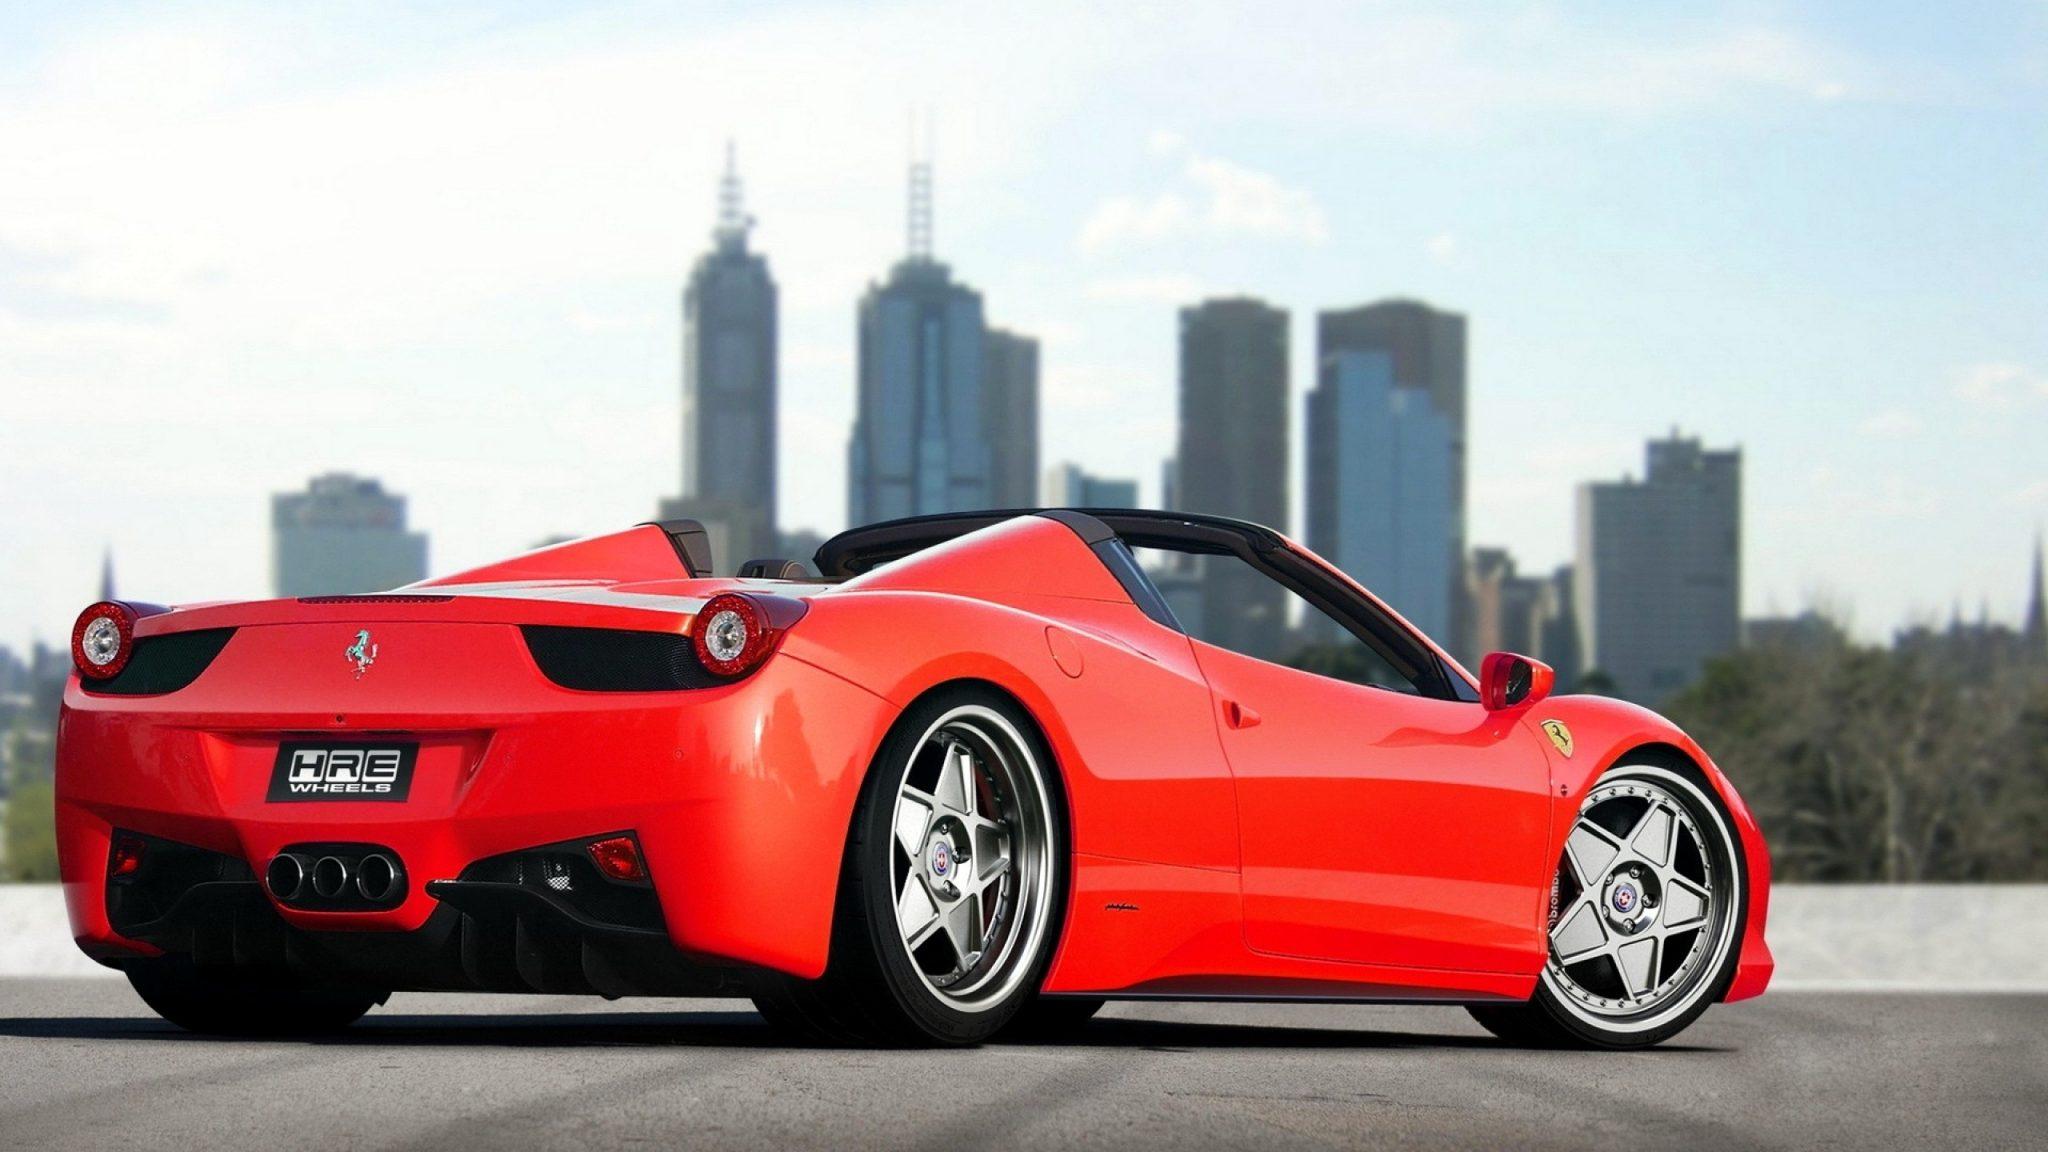 Ferrari 458 Italien Hd Ferrari 458 Wallpaper 2048x1152 Wallpapertip